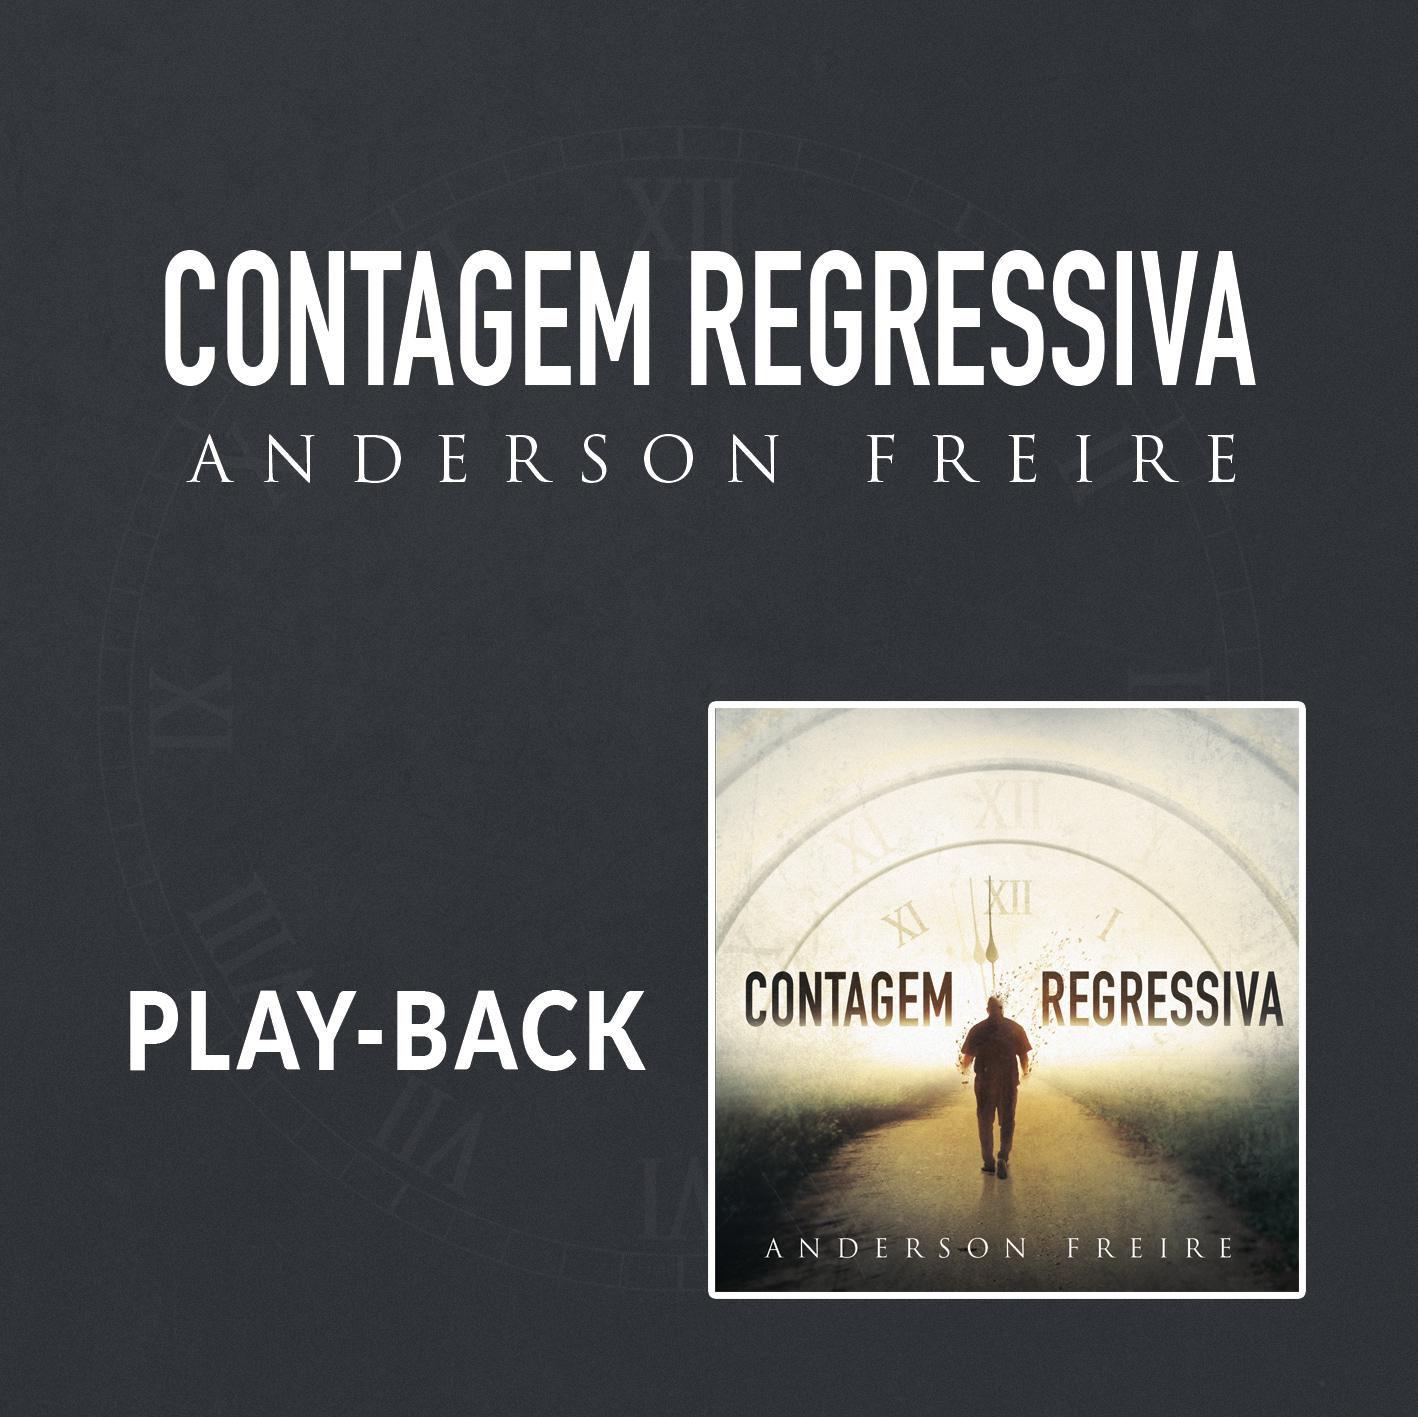 PB - Anderson Freire - Contagem regressiva (playback)